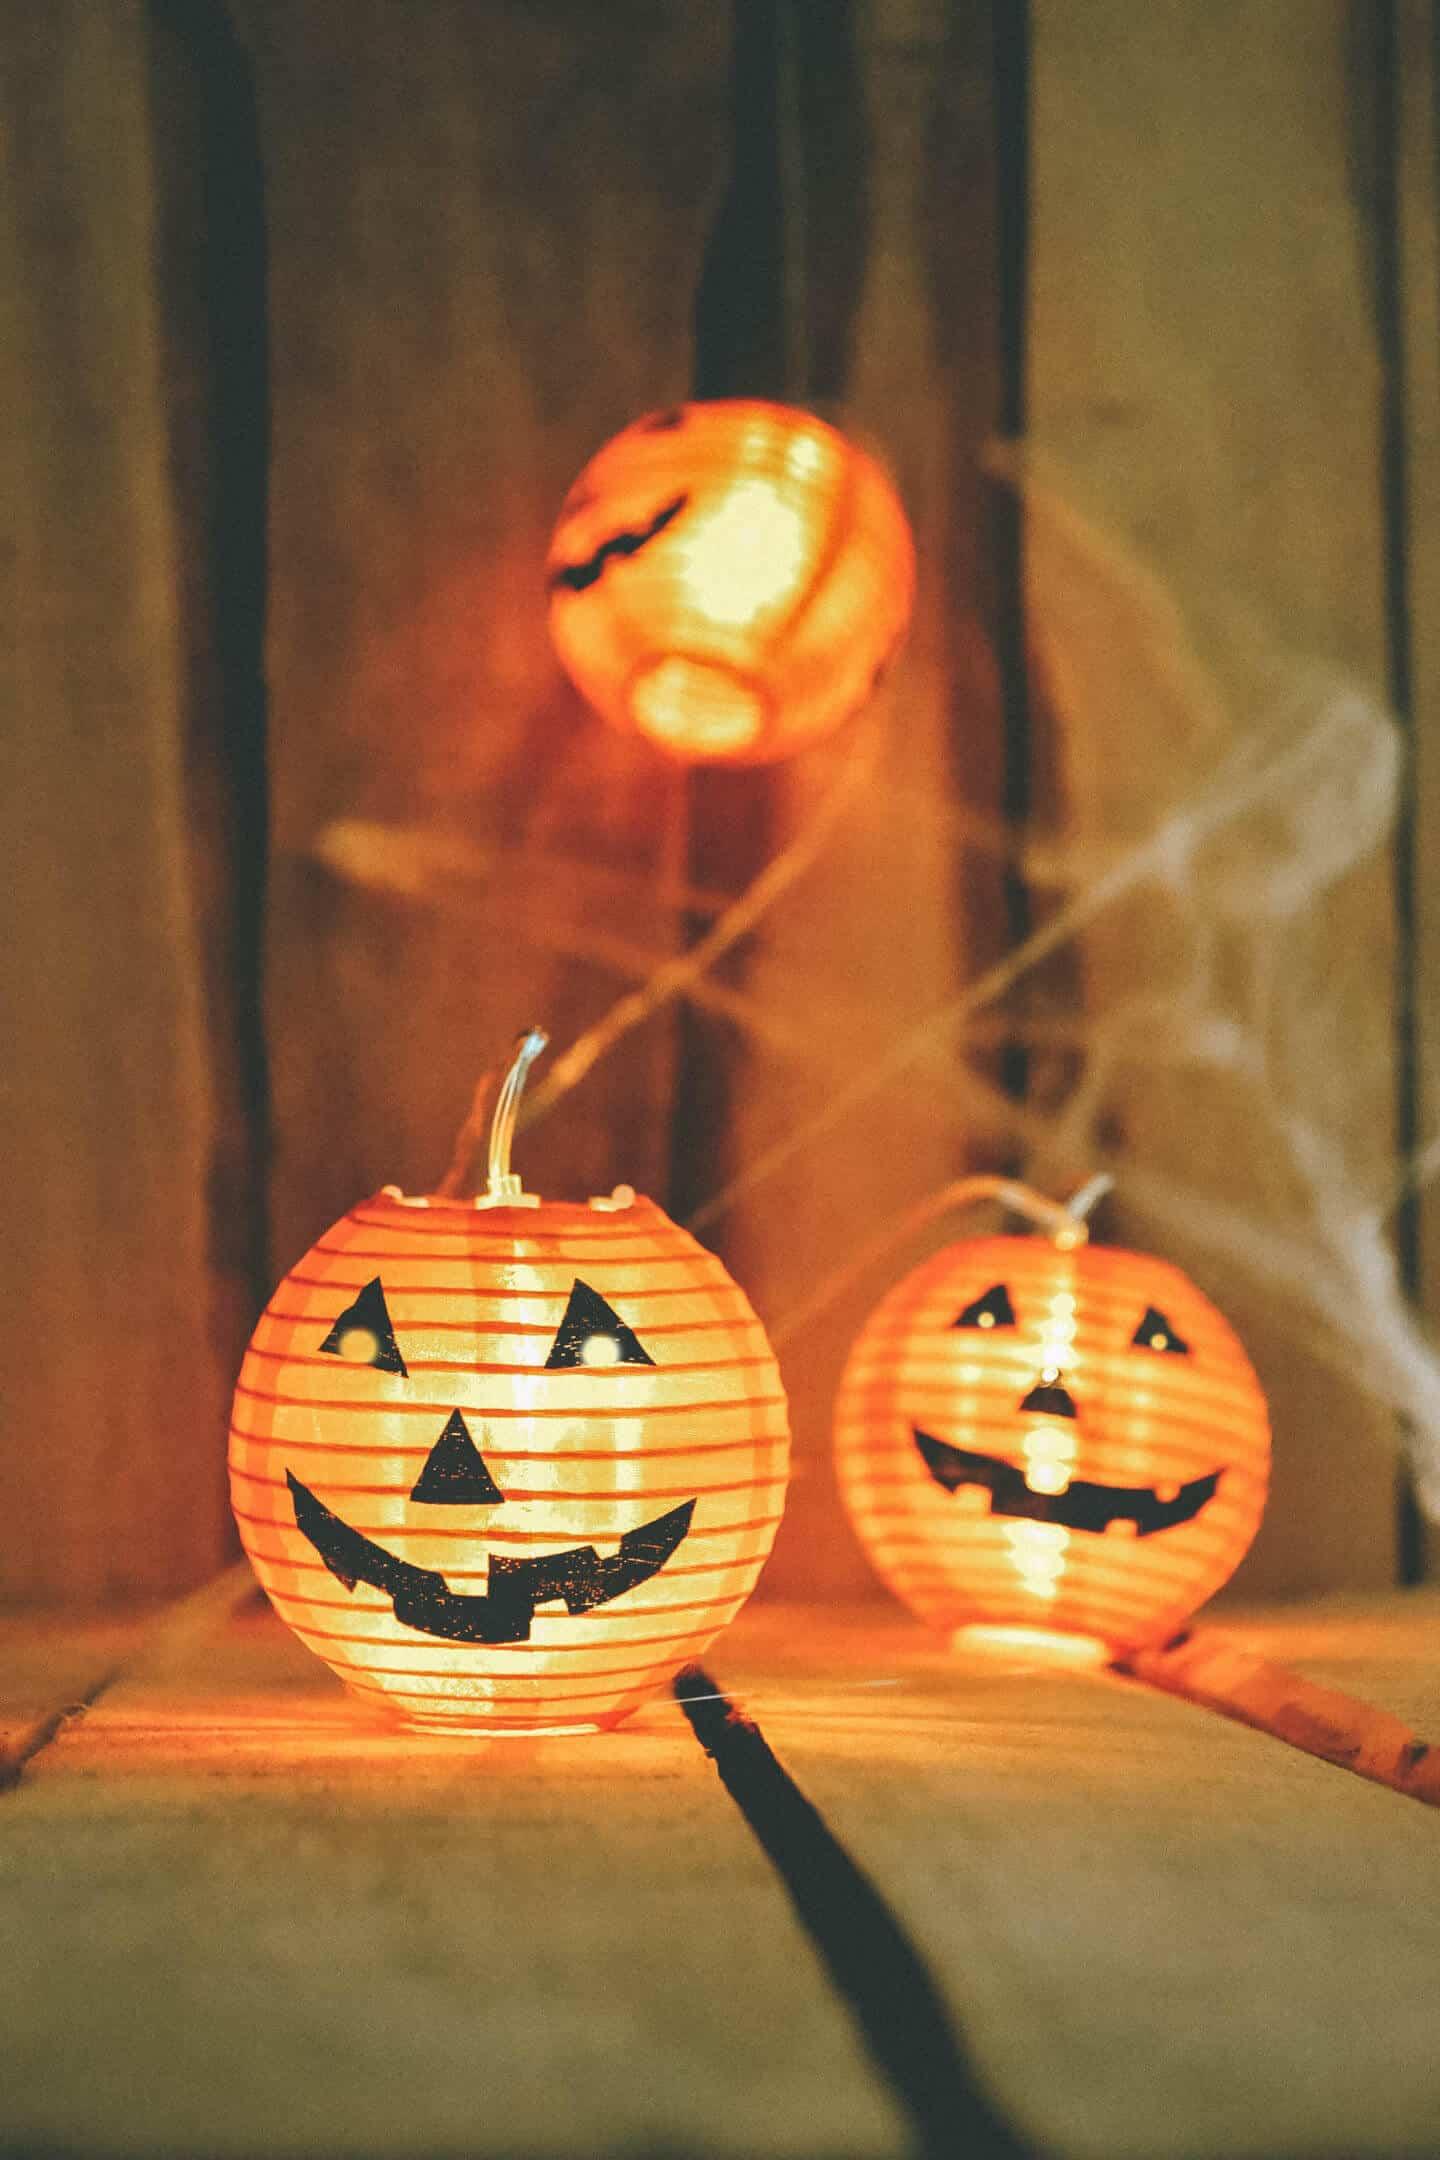 Halloween Decoration Set Cute Wood Pumpkins, Three Silly Jack-O-Lanterns